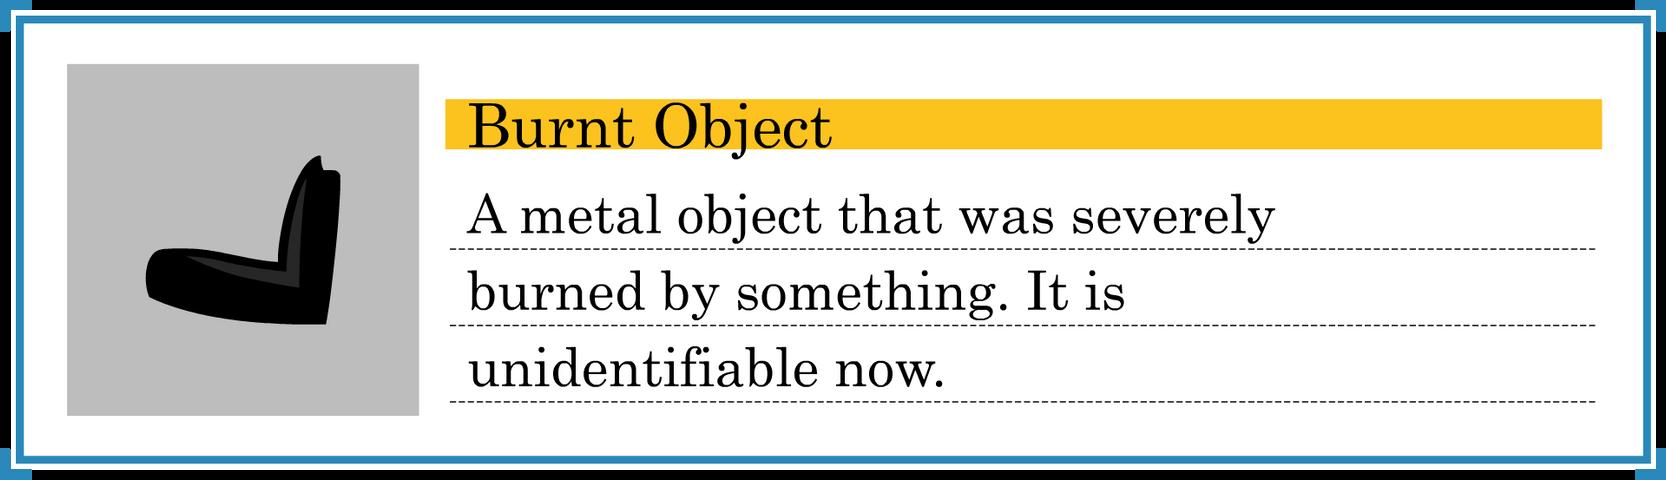 Burnt Object Evidence [Shaded]